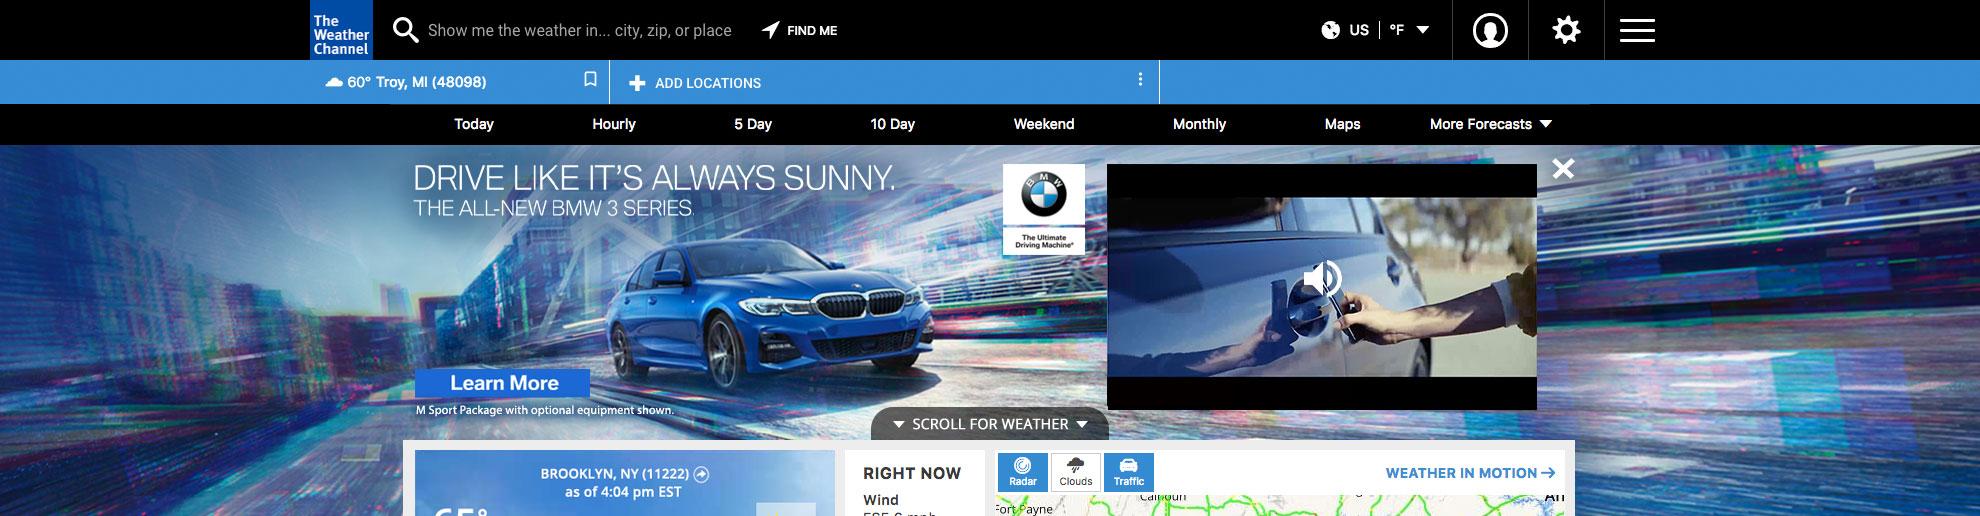 BMW-00_day_clear